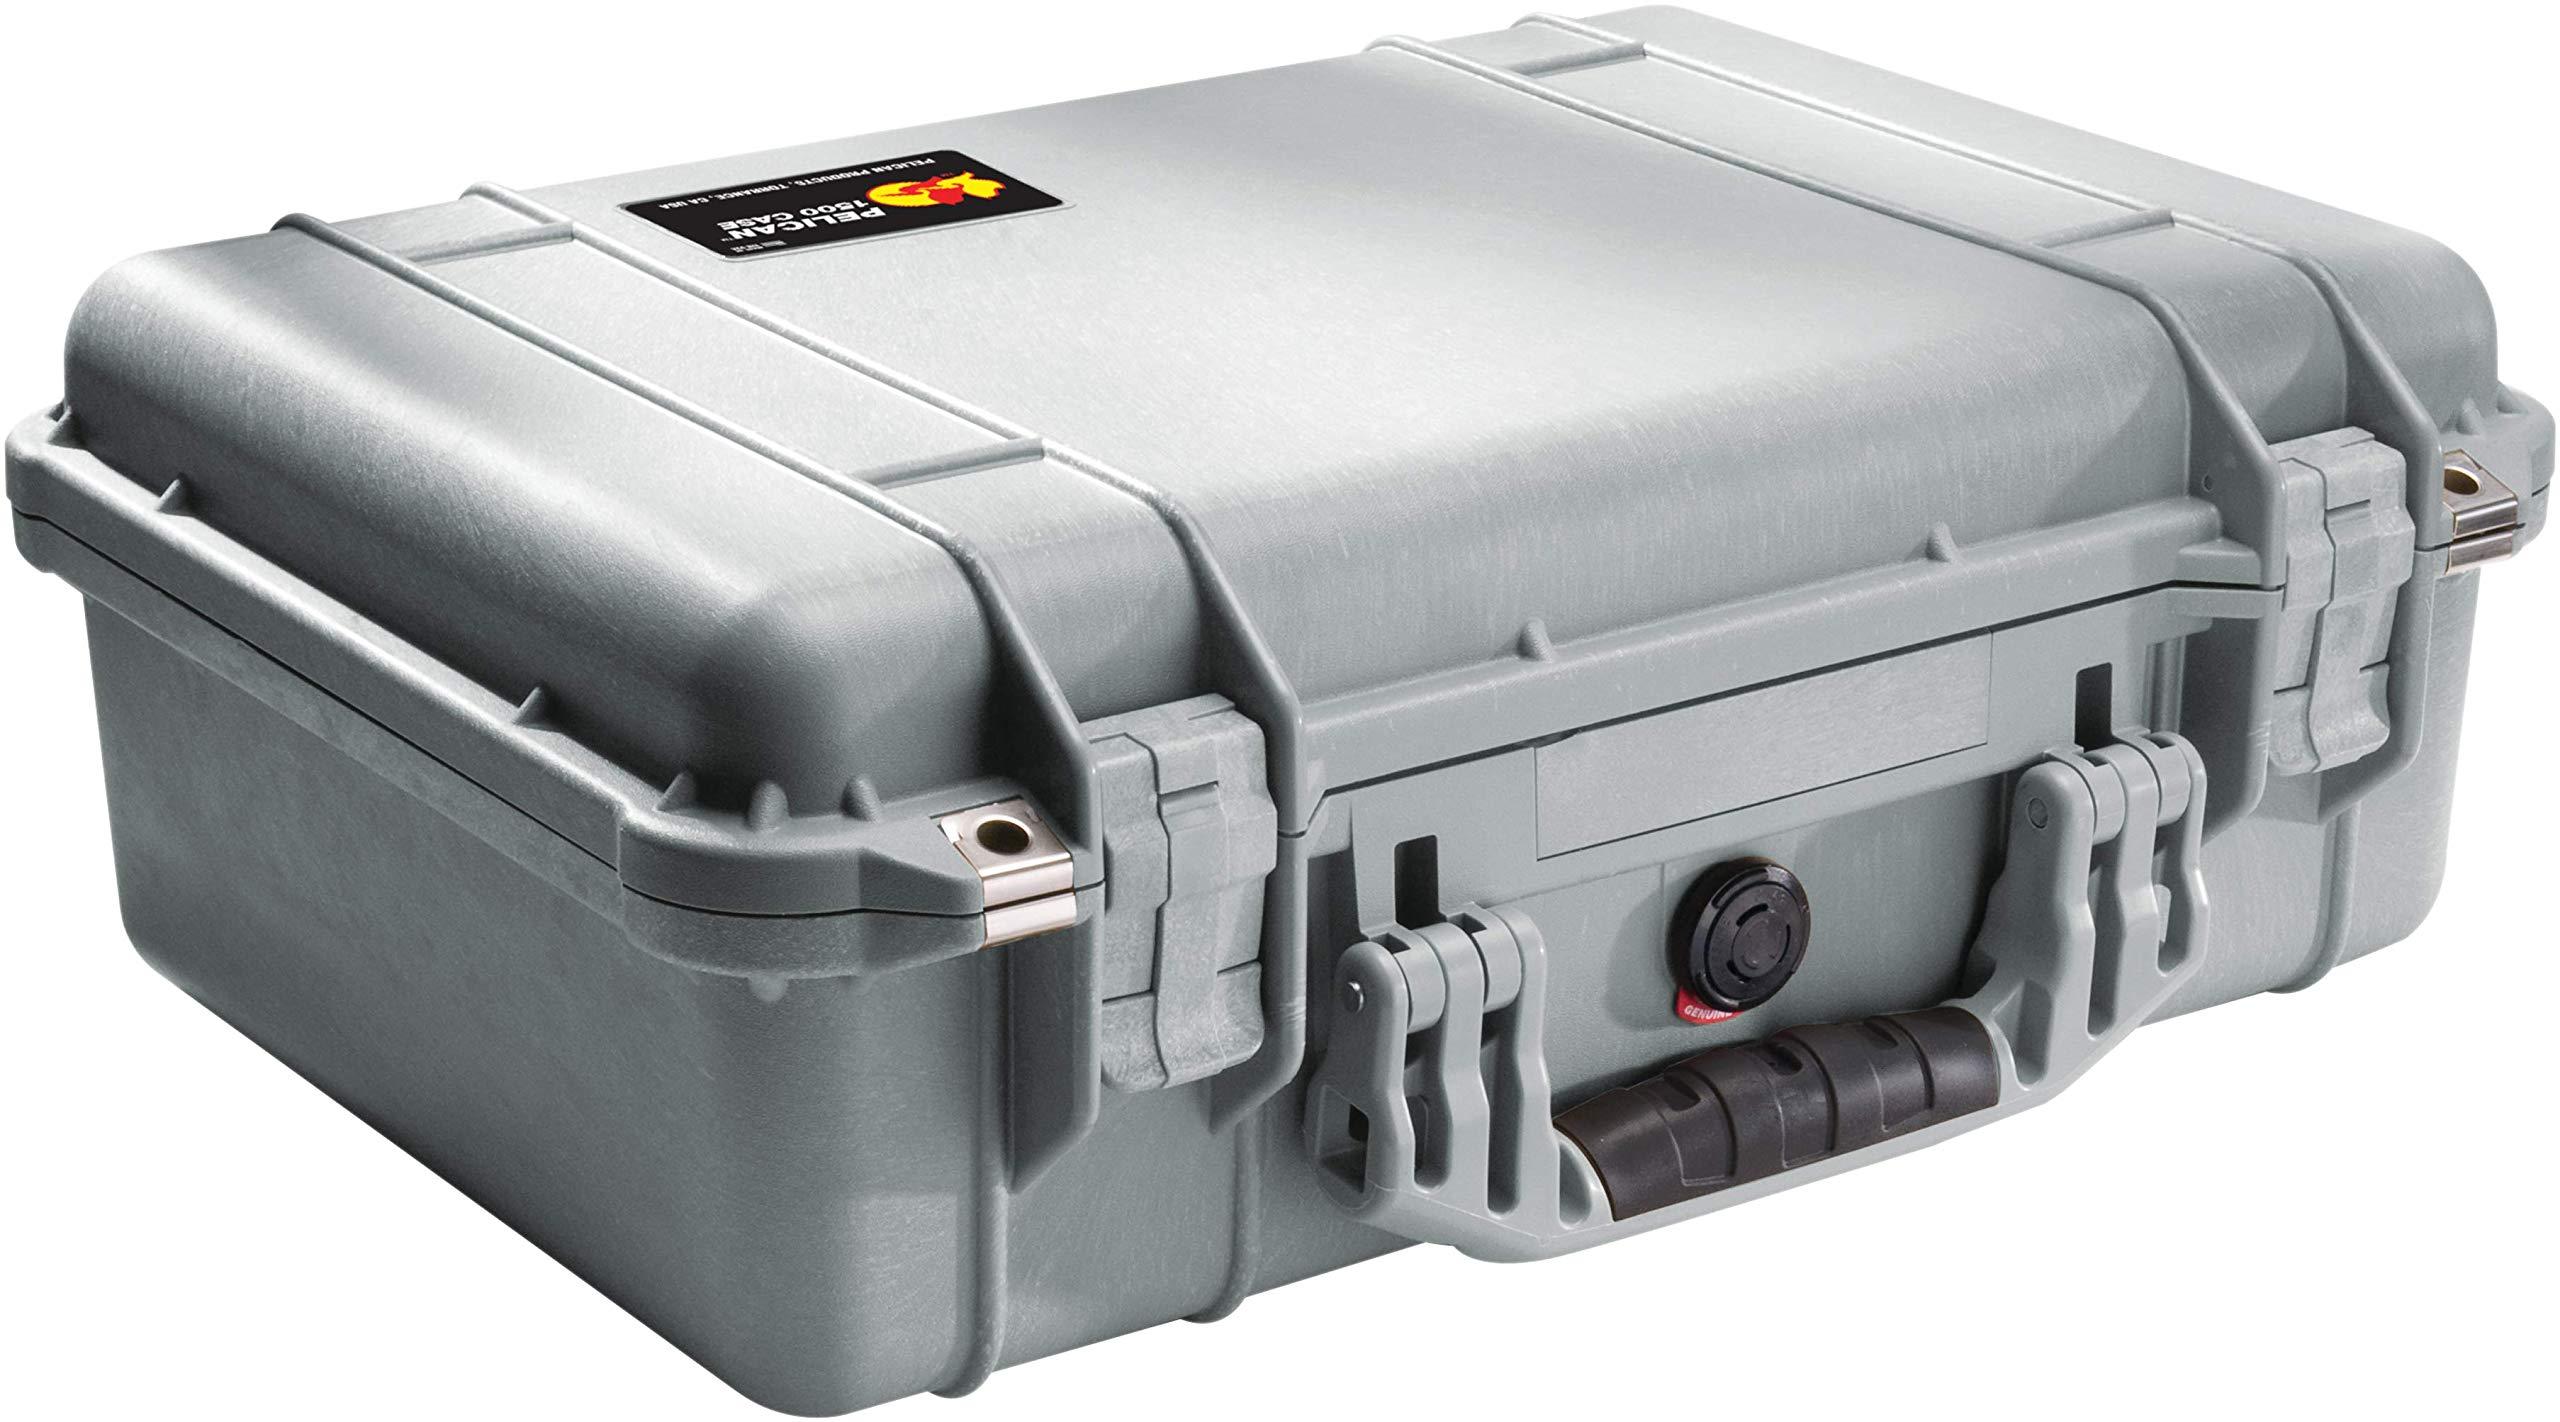 Pelican 1500 Camera Case With Foam (Silver)